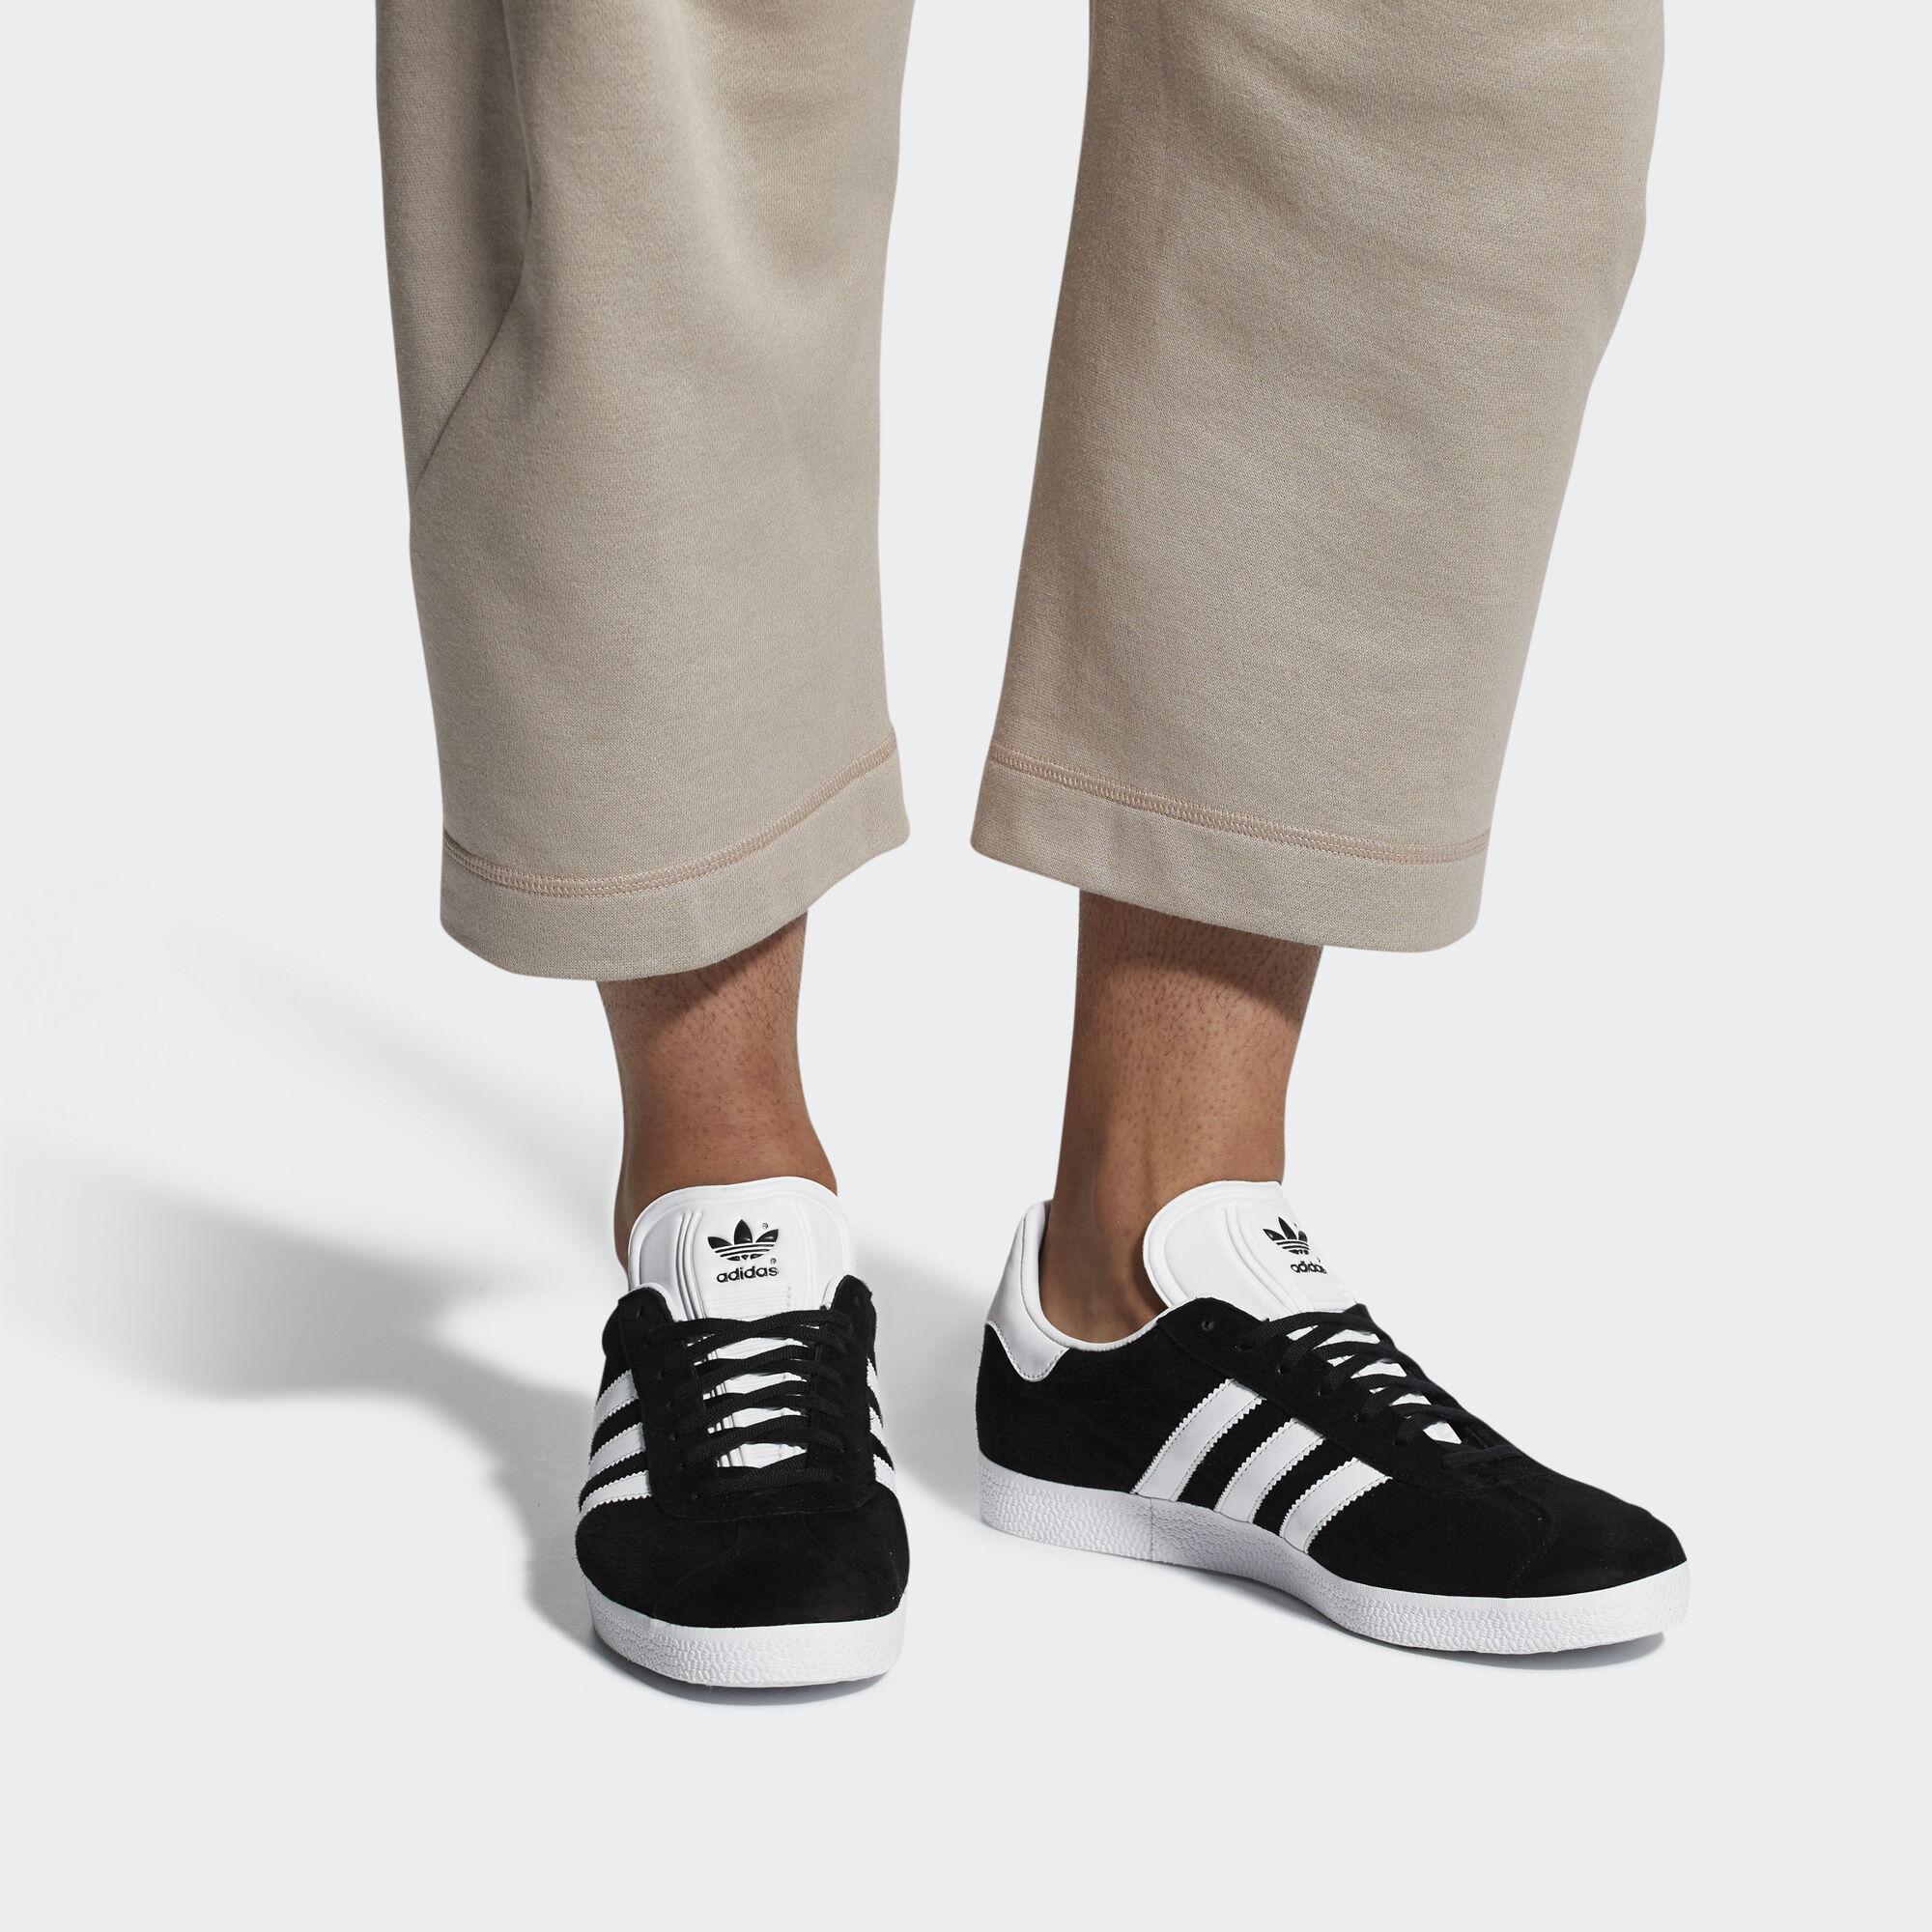 promo code d1043 48f97 adidas Gazelle Shoes - Rosa  adidas MLT